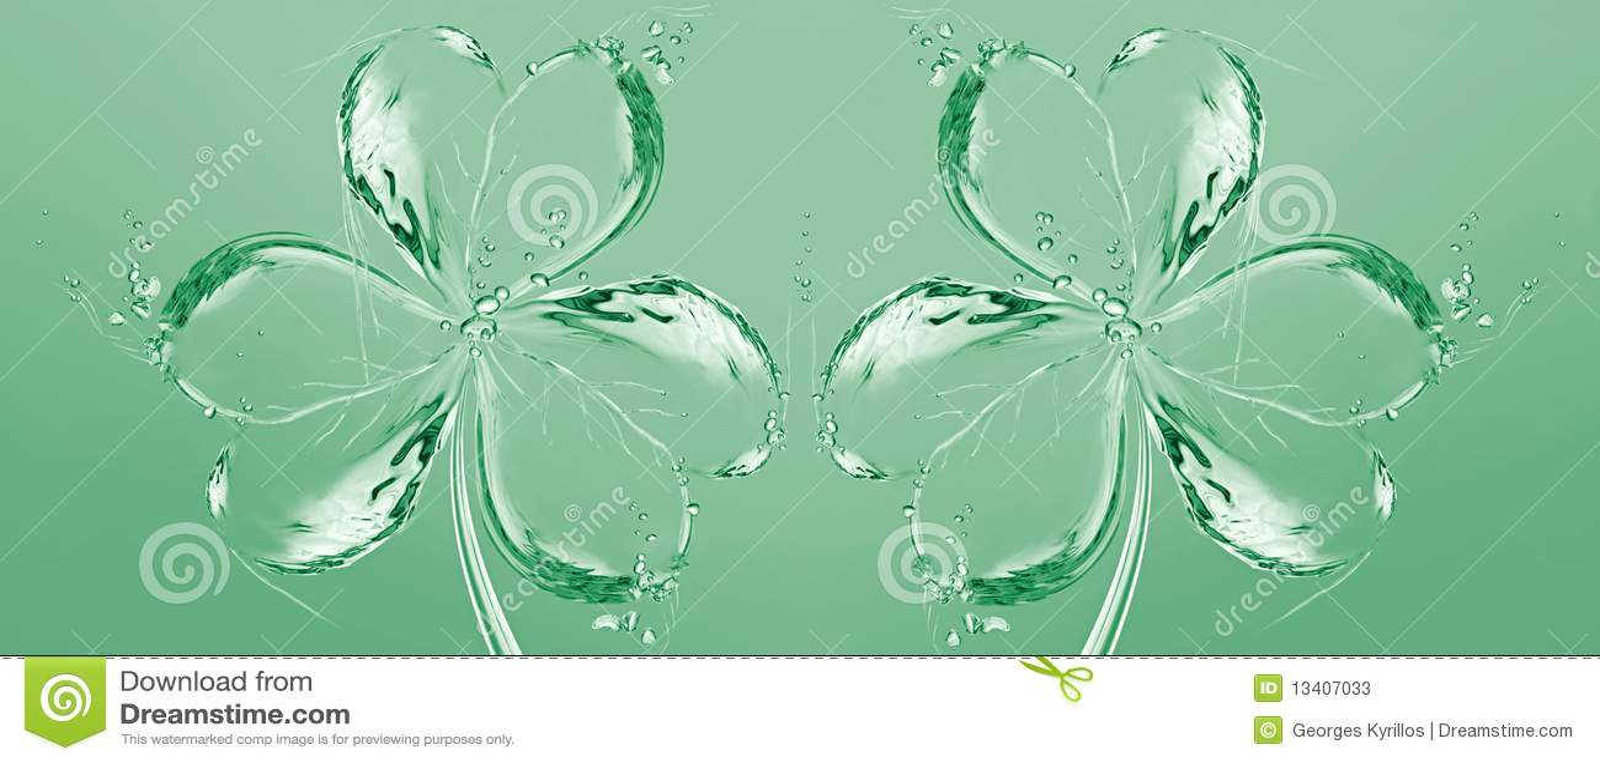 вода shamrocks 2